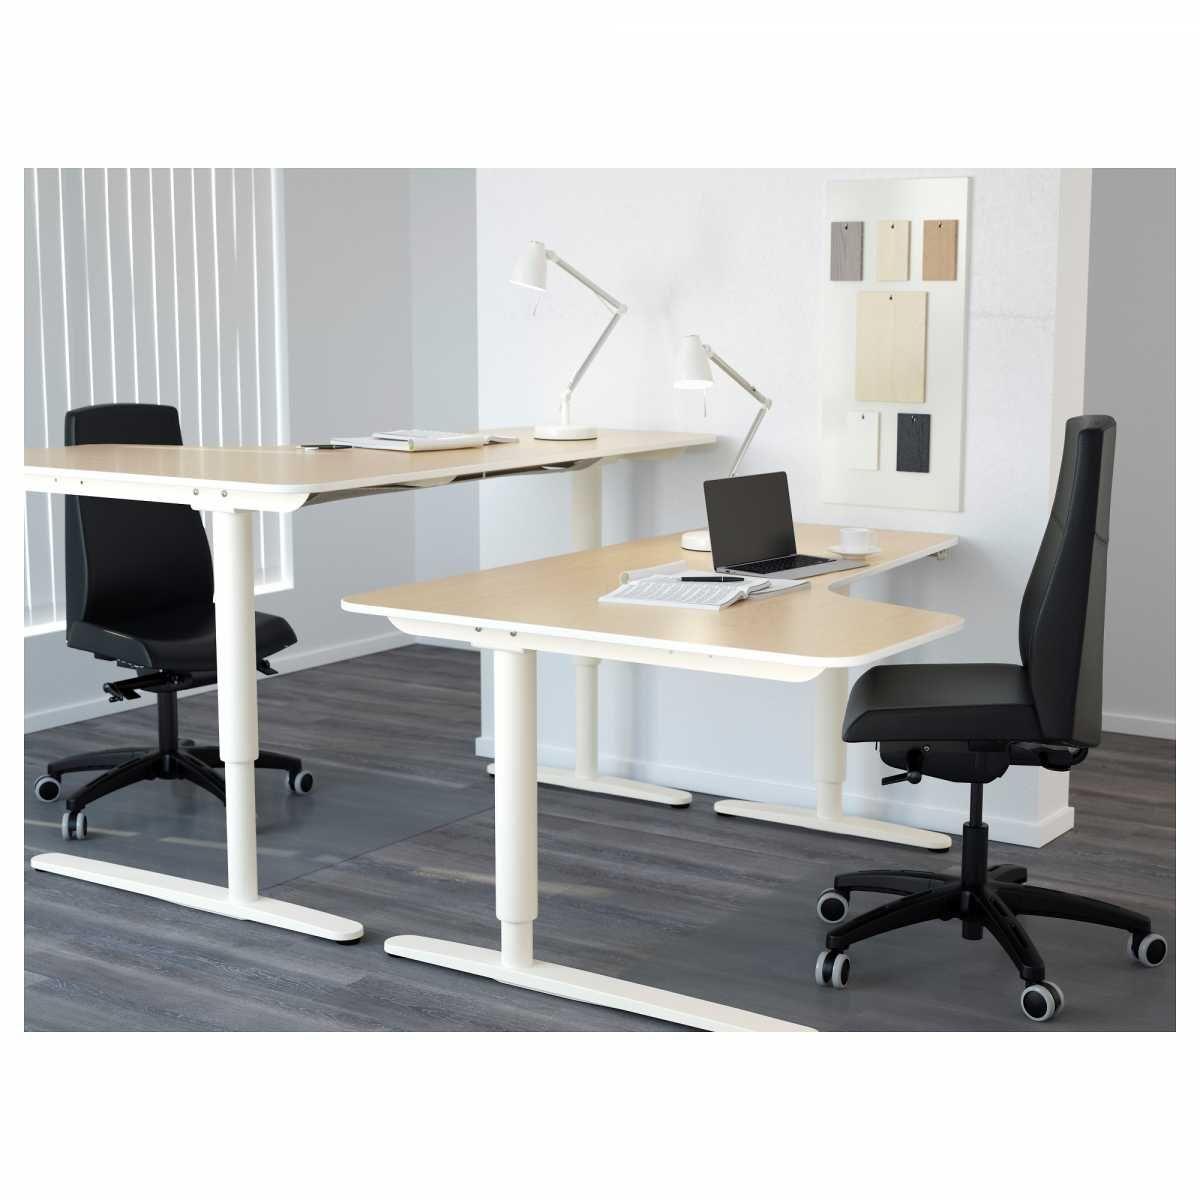 Ikea Bekant Corner Desk New Review Home Office Furniture Ikea Bekant Home